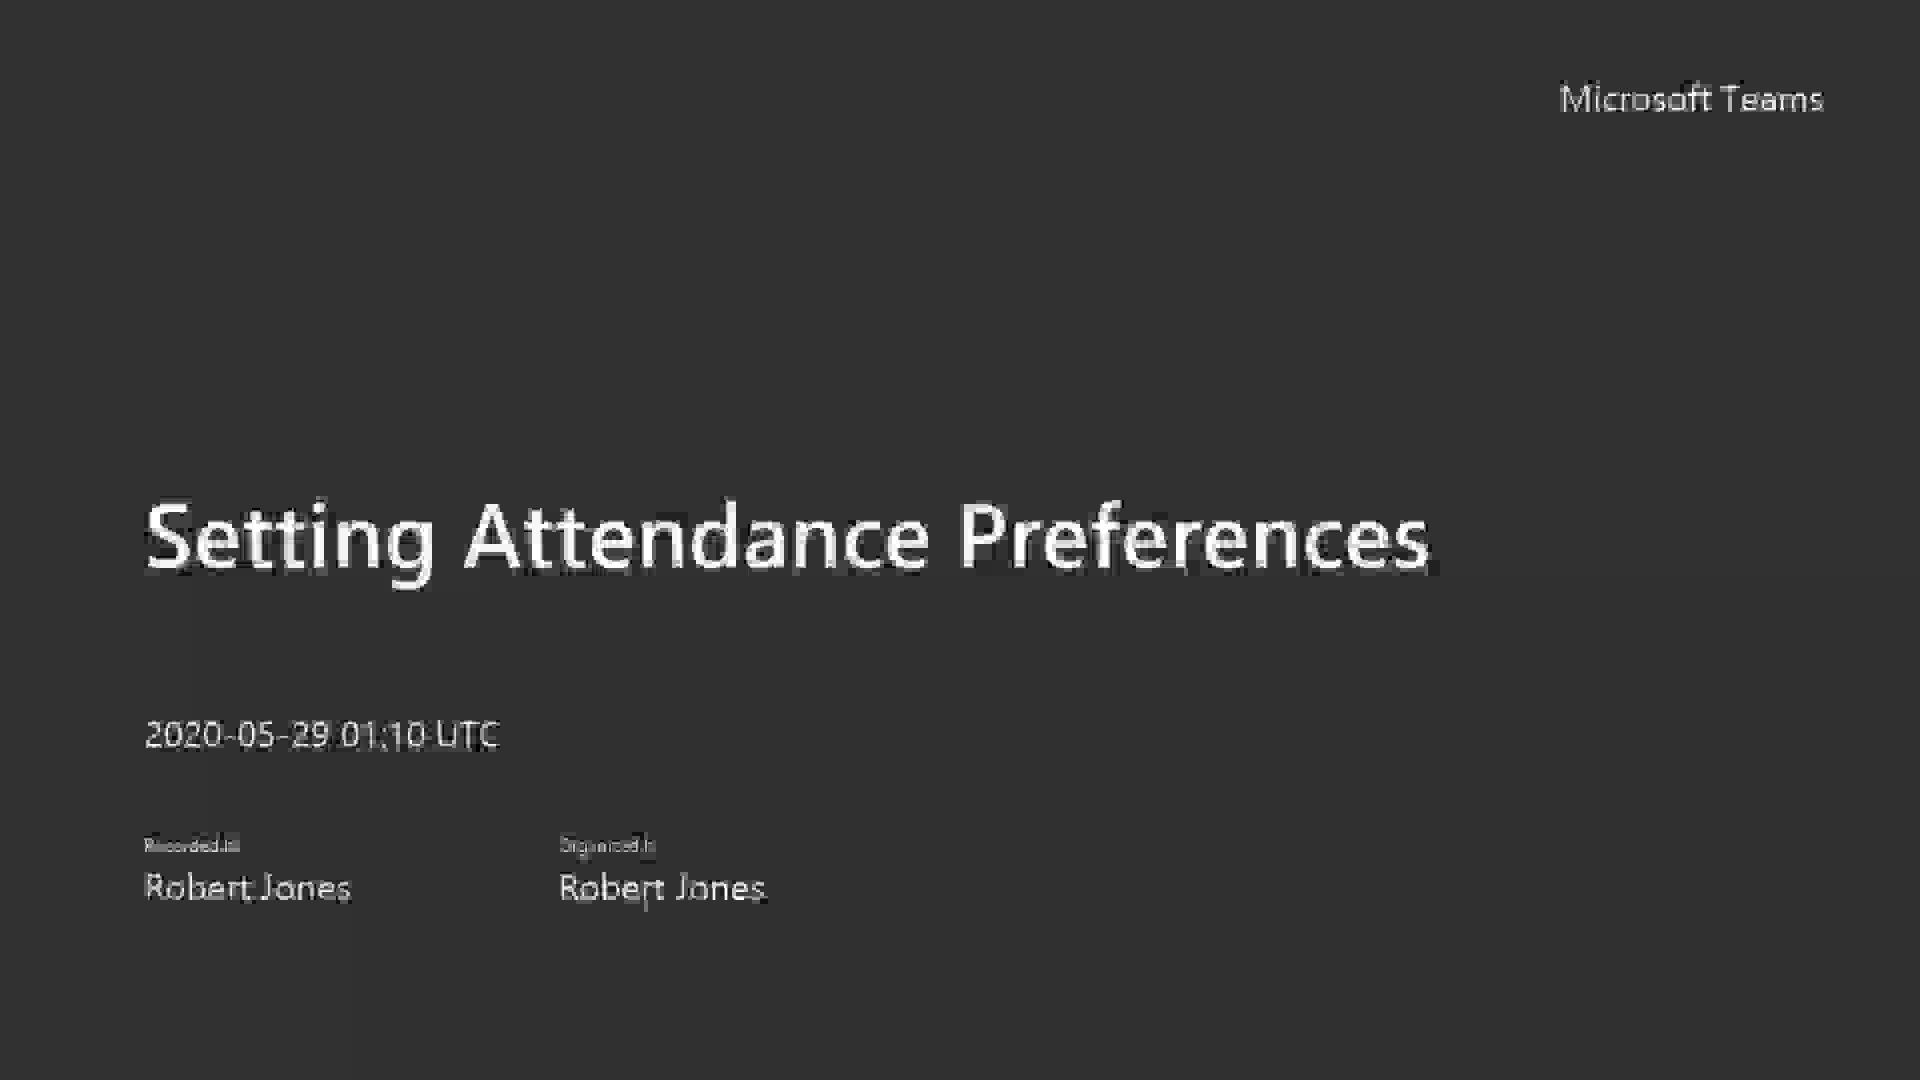 4.2 Setting Attendance Preferences